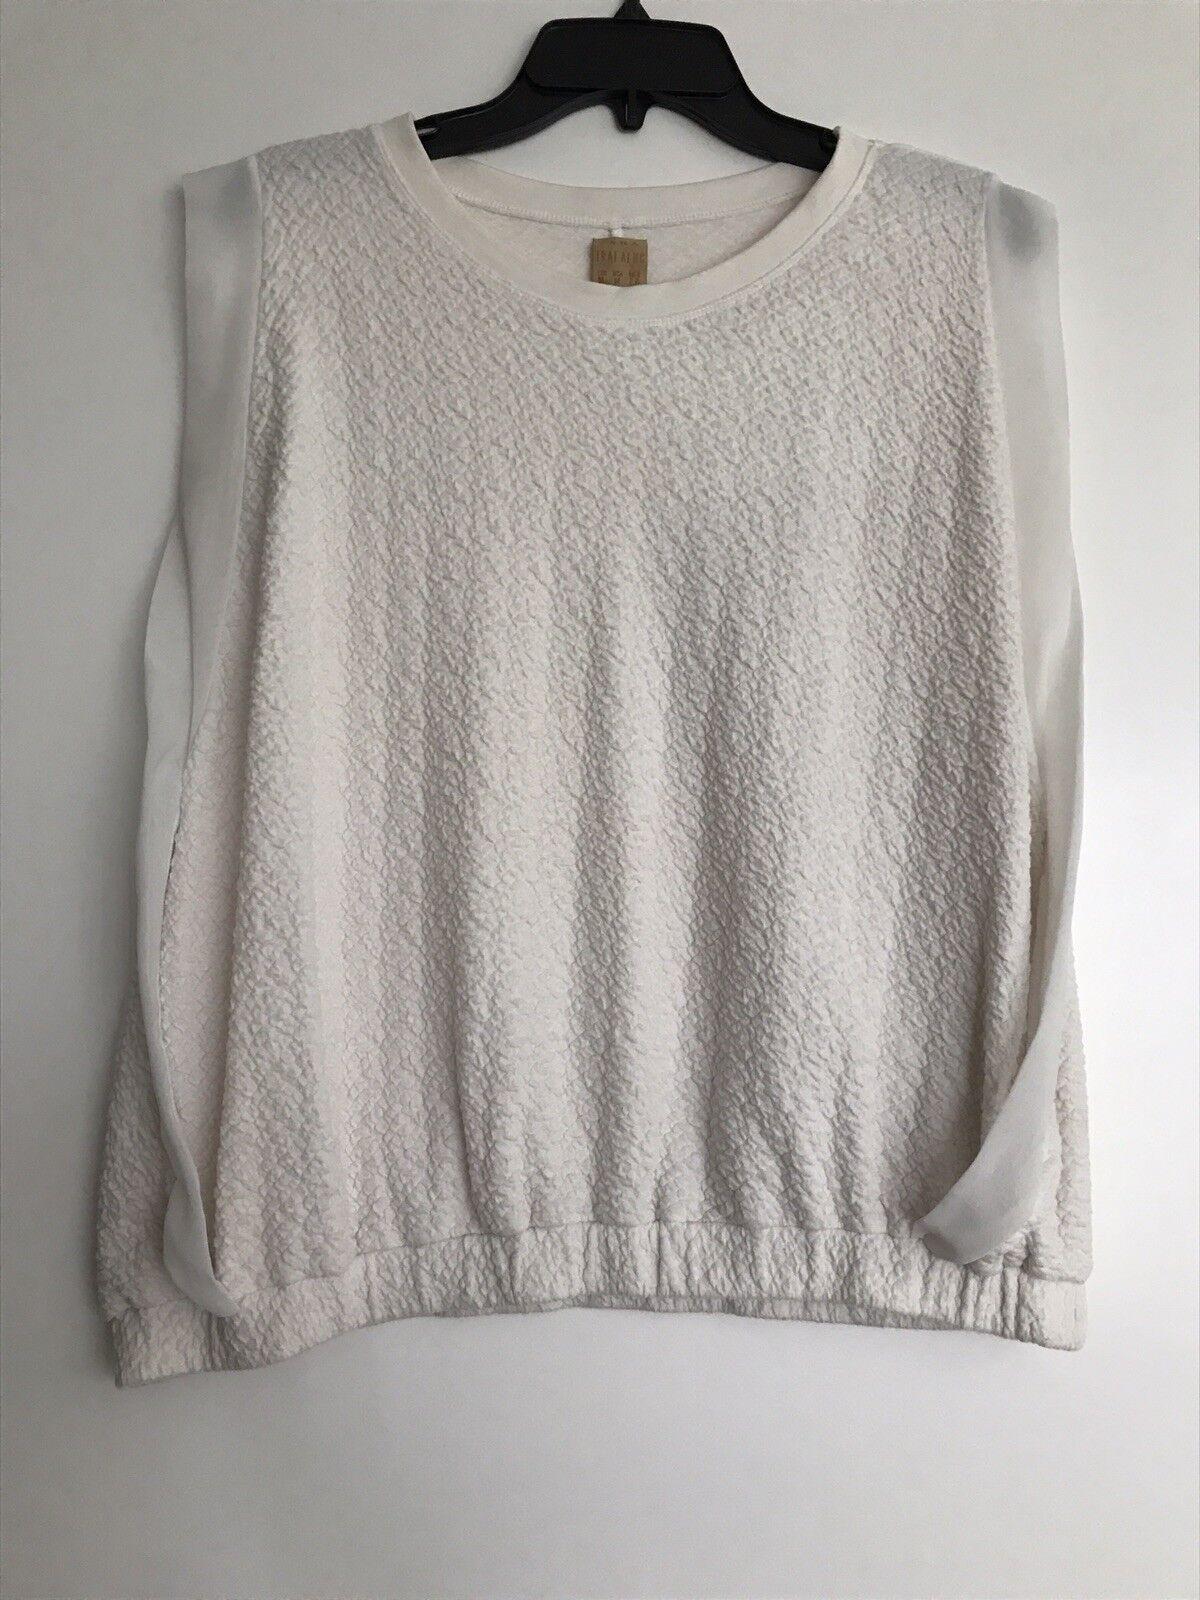 Zara White Textured Top - Size M